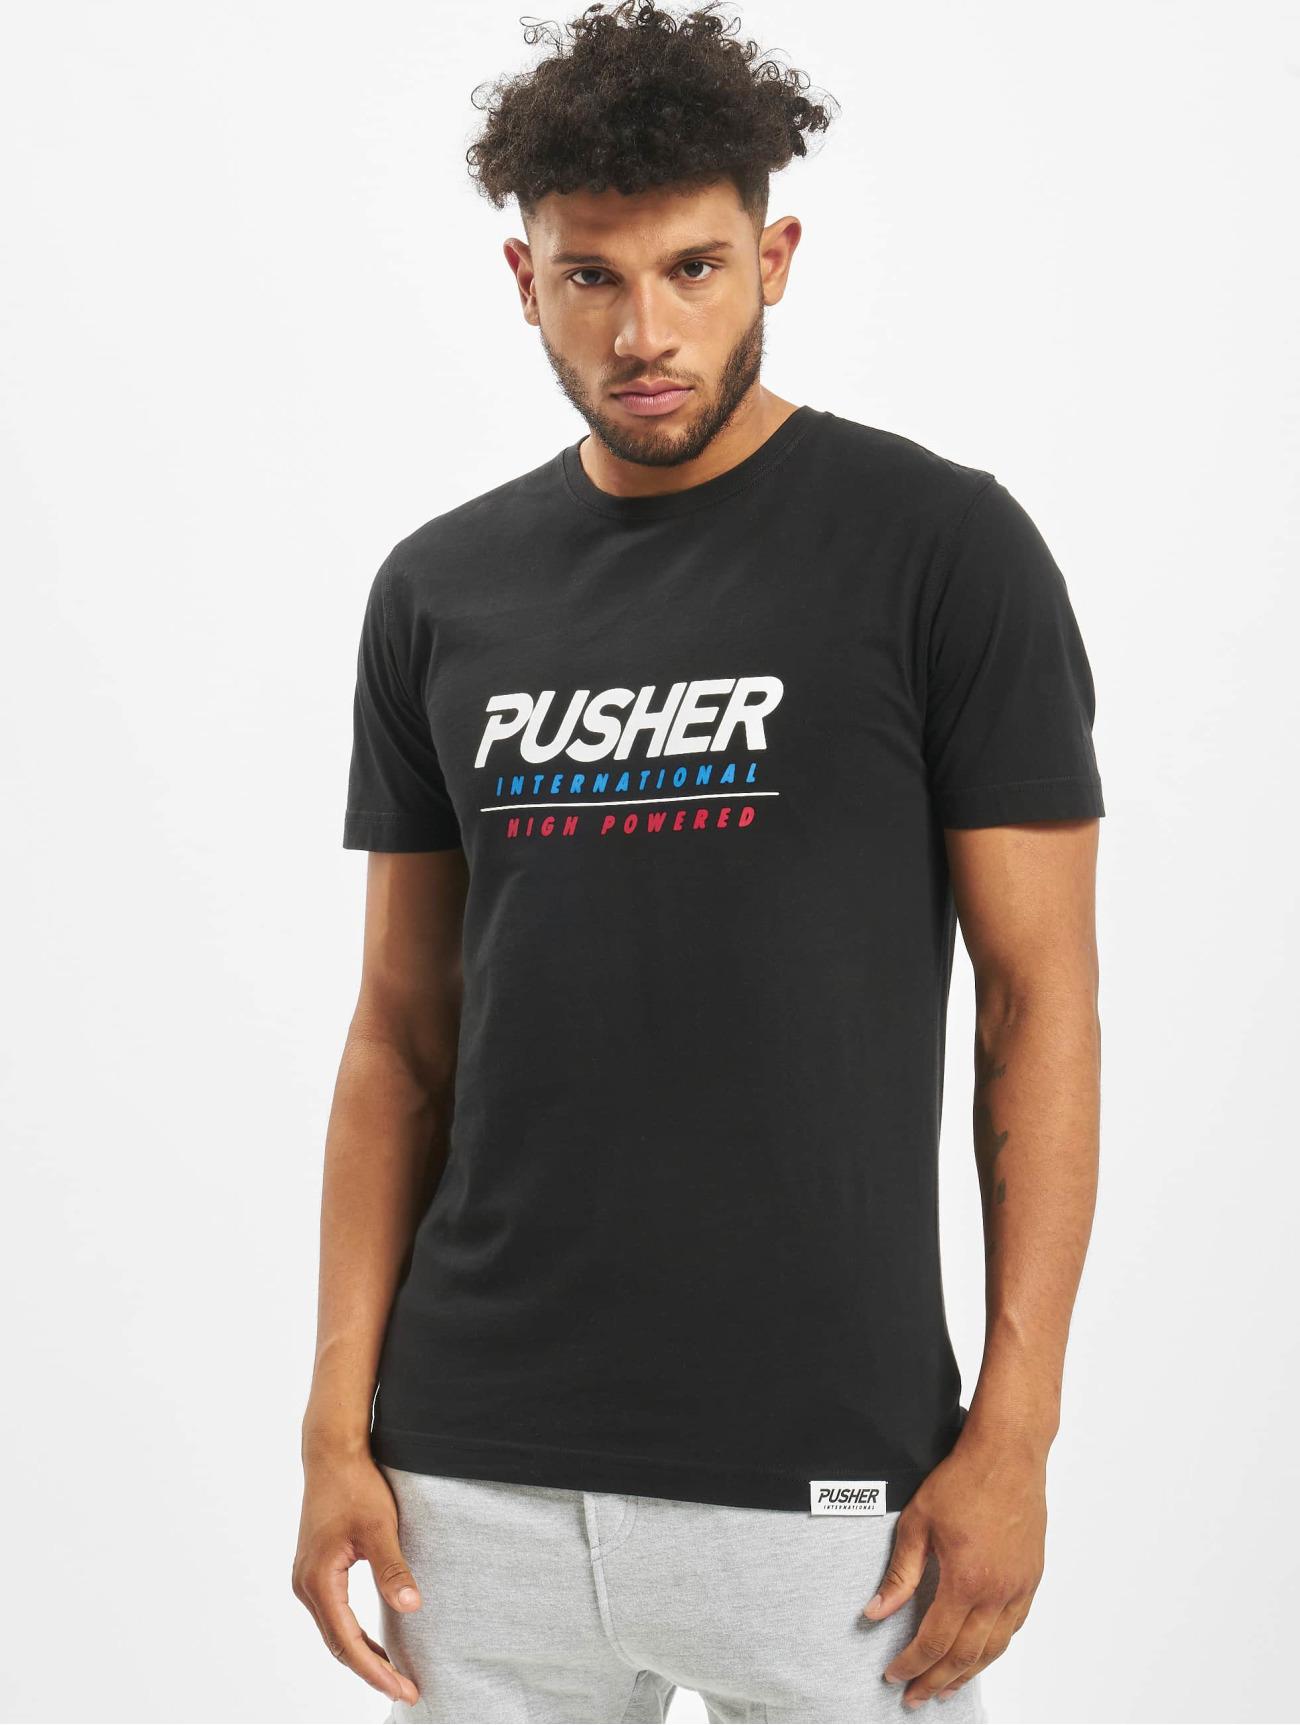 Pusher Apparel Herren T-Shirt Apparel High Powered in schwarz 629946